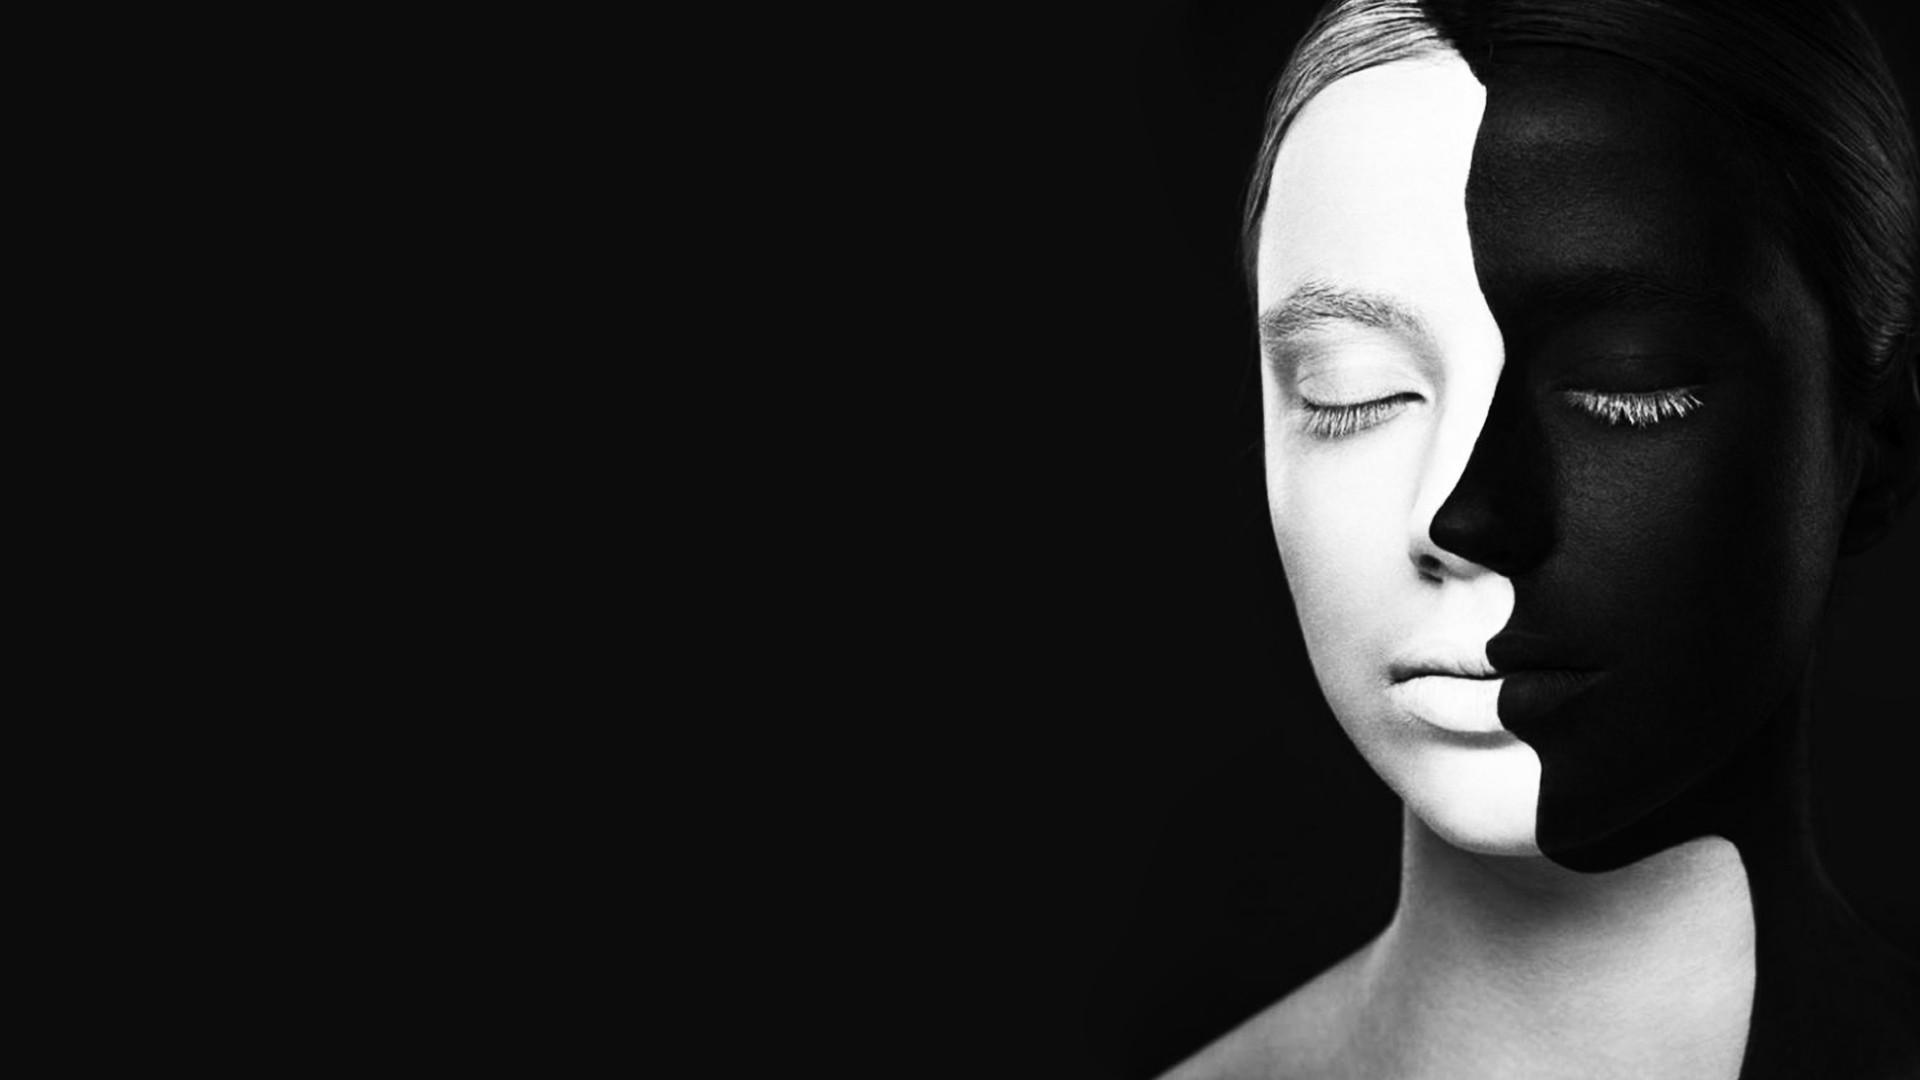 Wallpaper Face Women Model Black Background Looking: Wallpaper : Face, Women, Model, Black Background, Closed